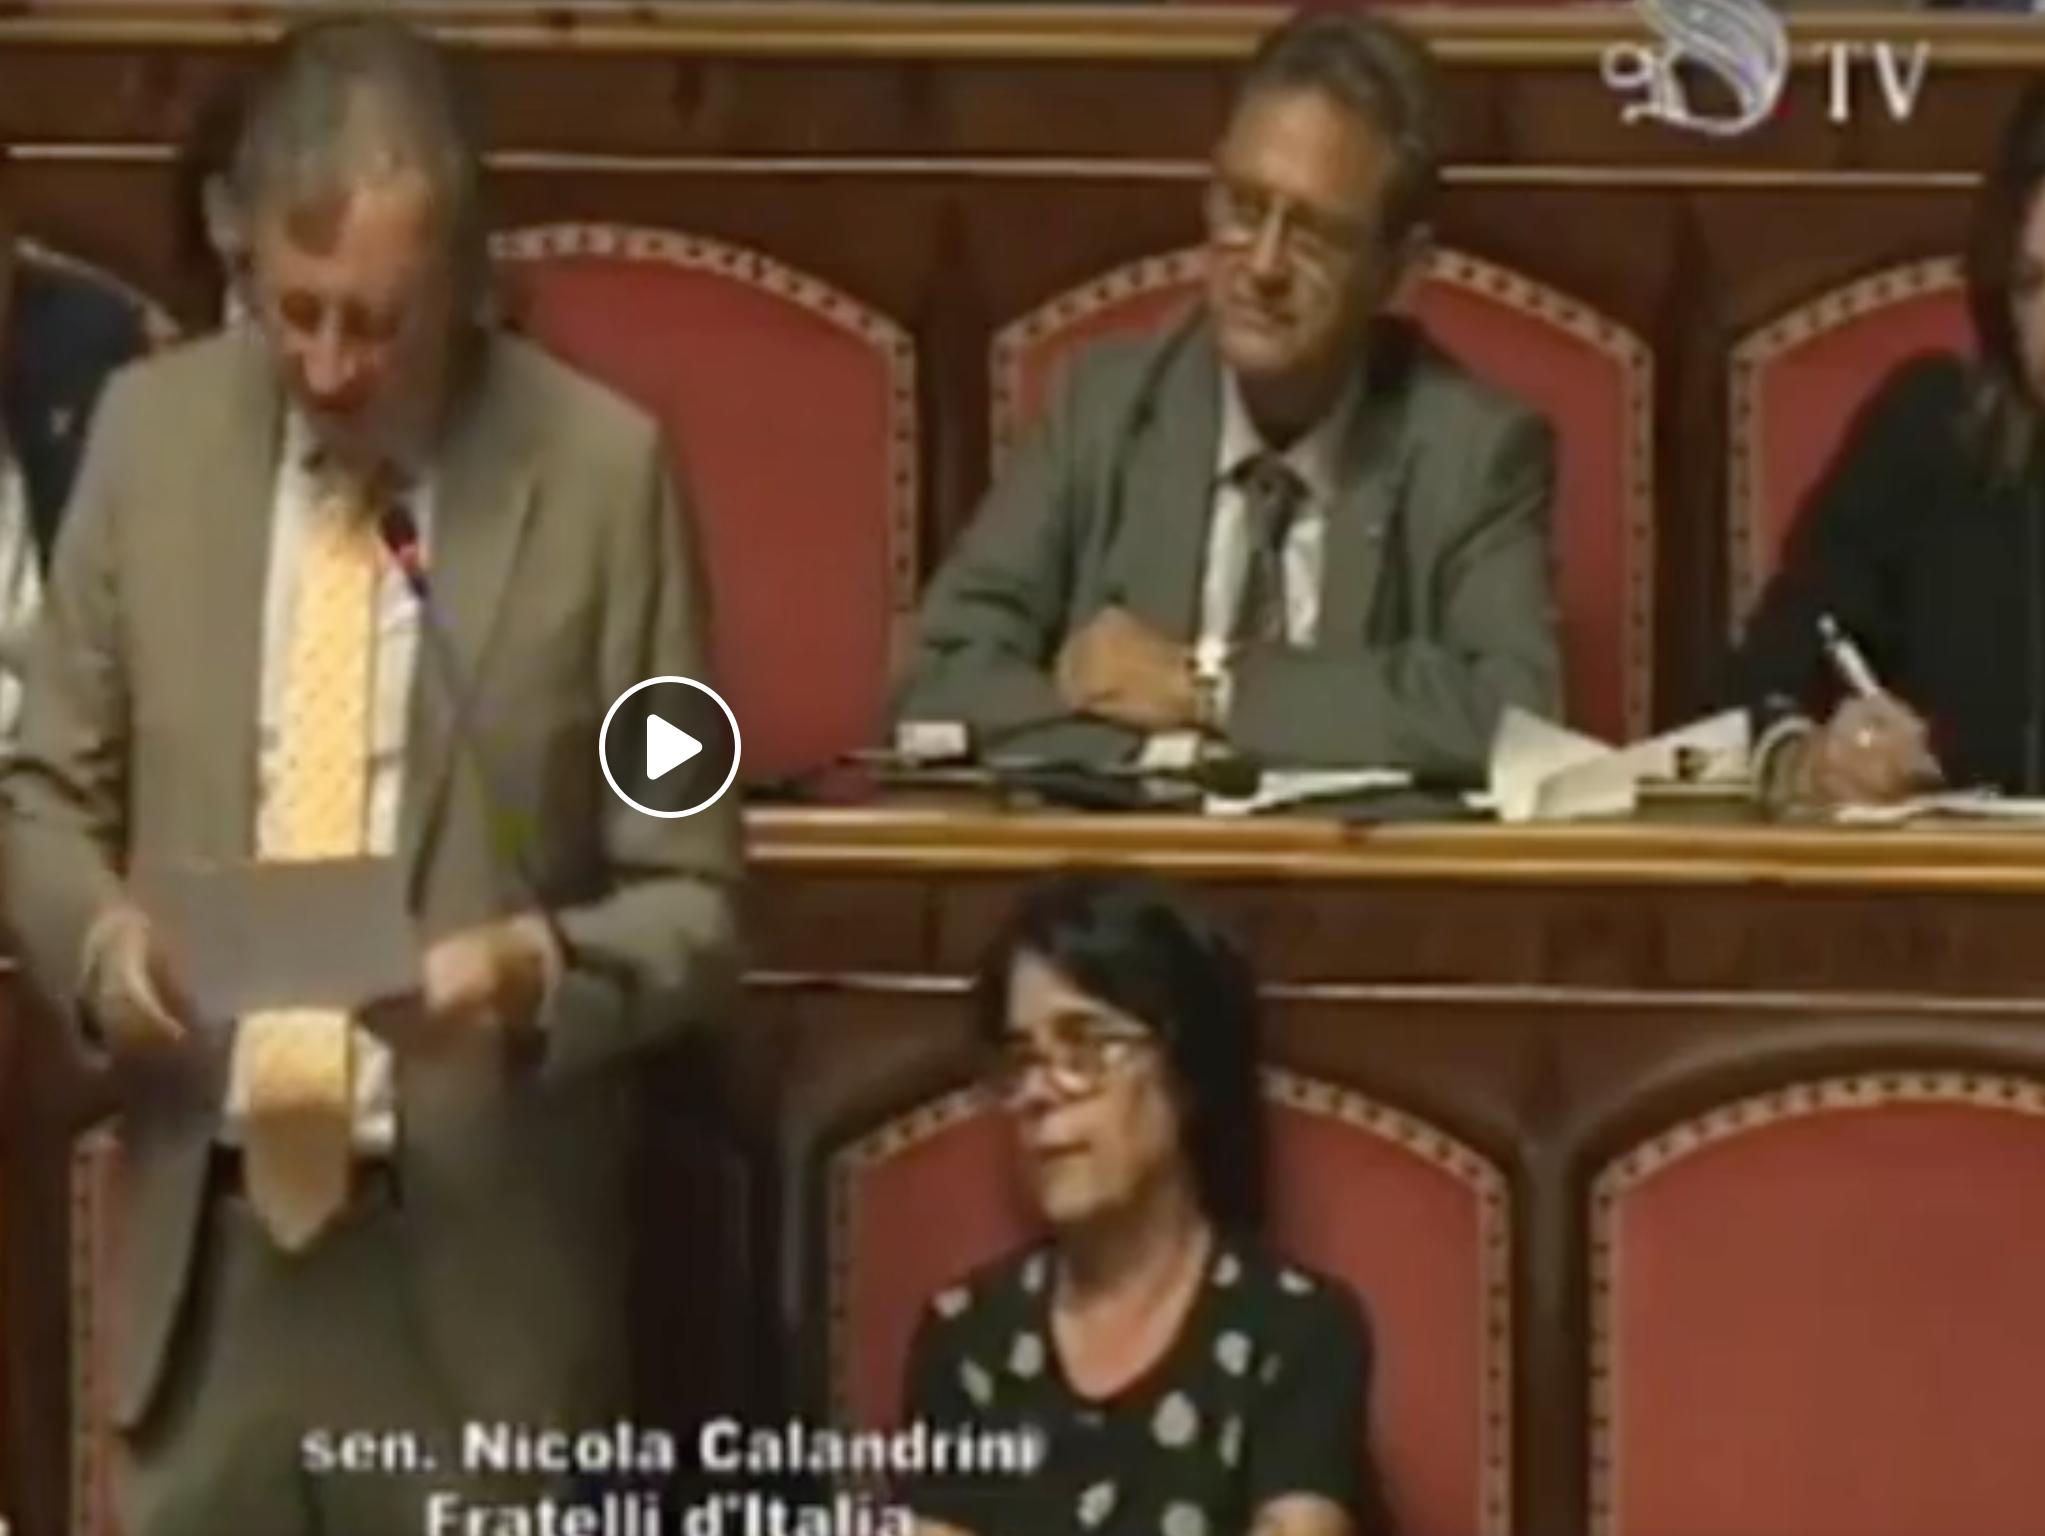 Nicola Calandrini